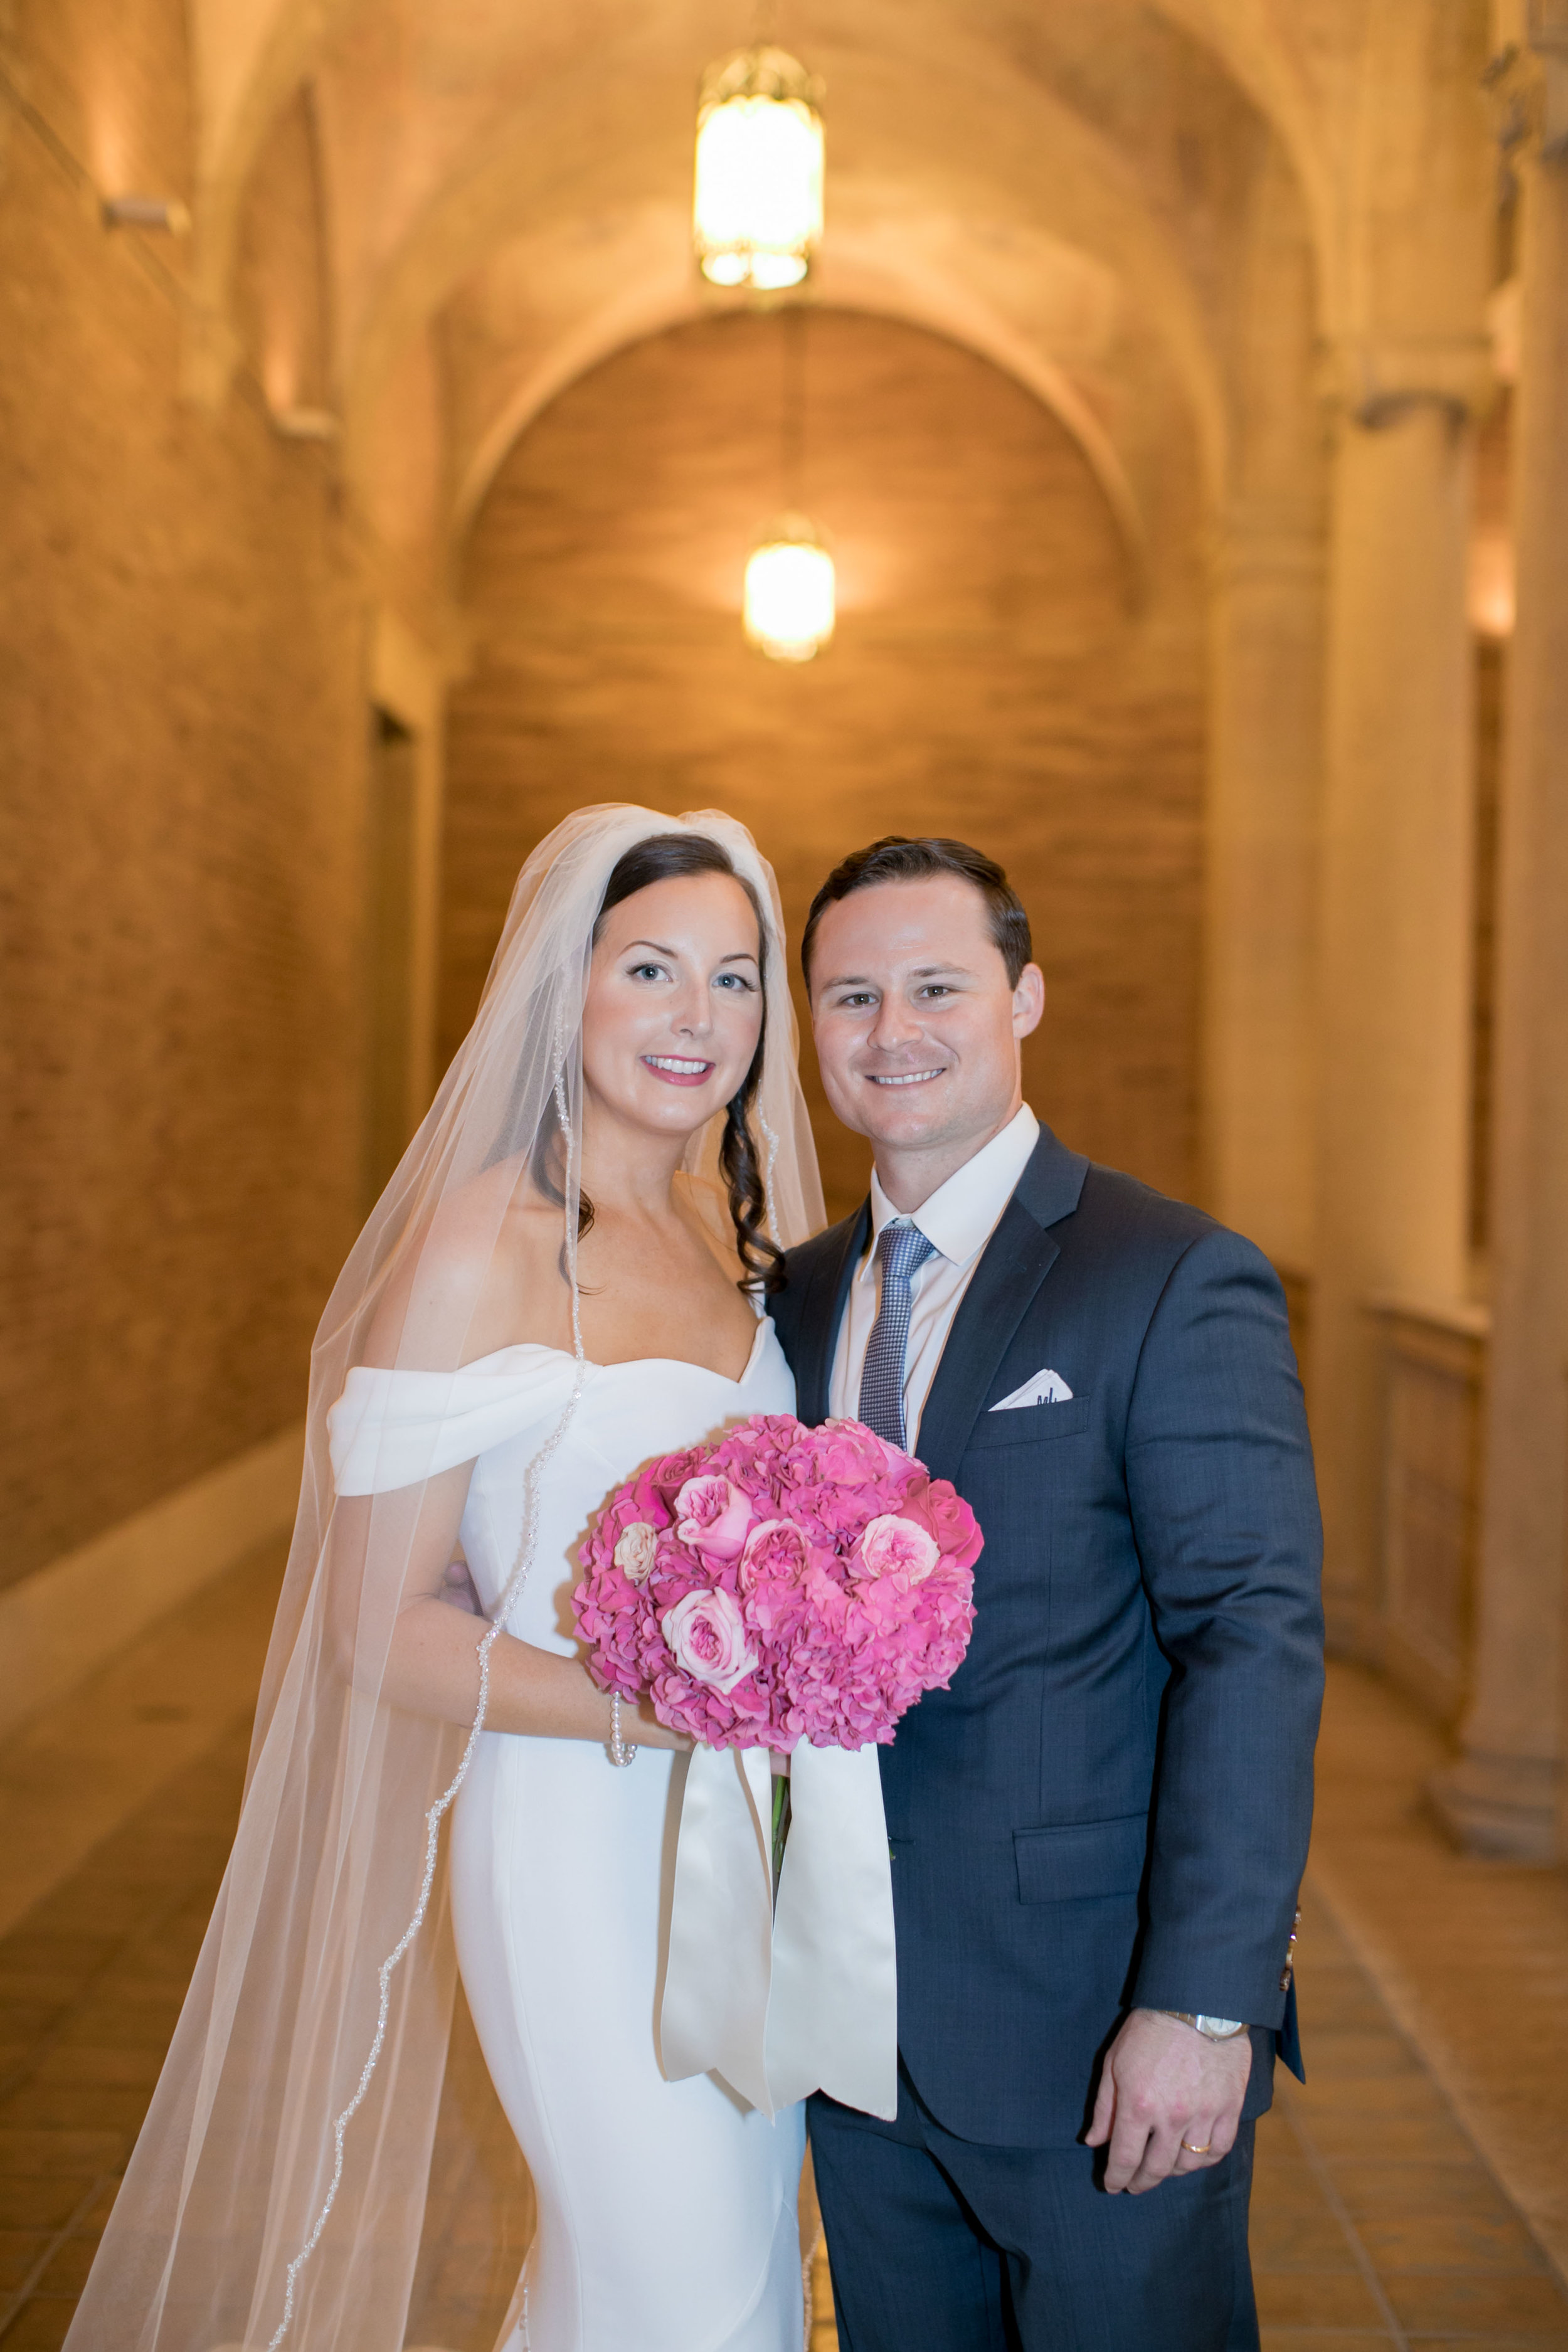 nelson-atkins-wedding-48.jpg